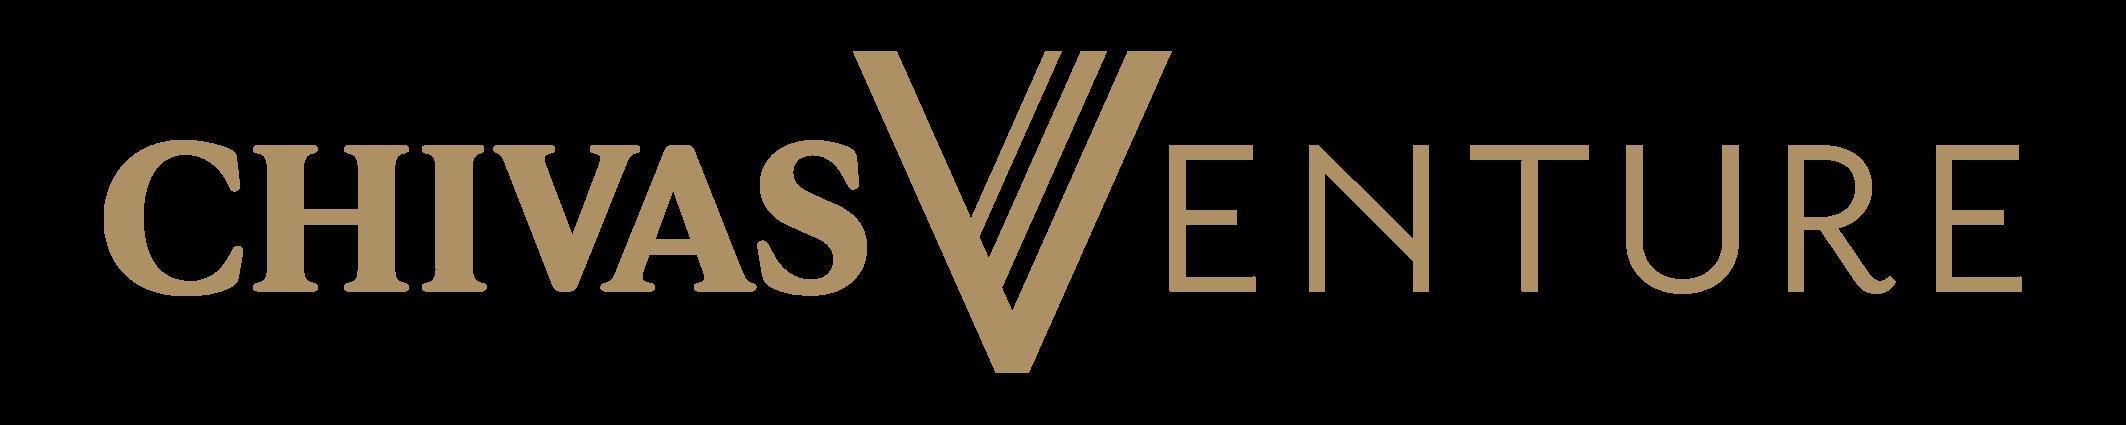 Chivas BeeOdiversity